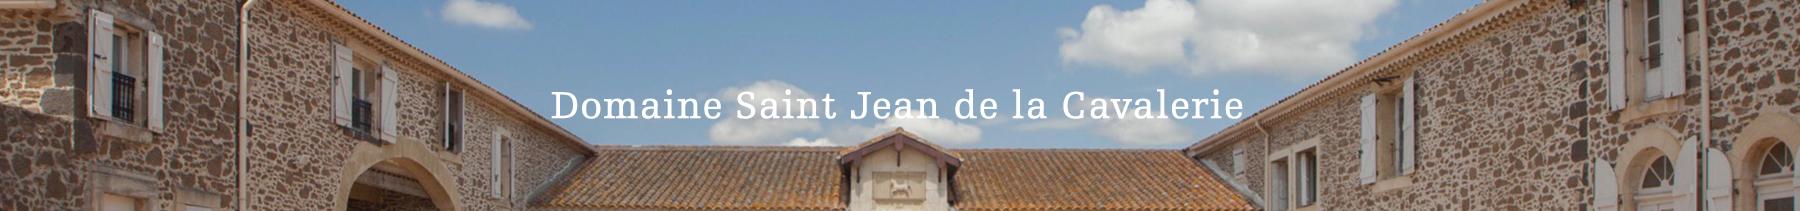 Domaine St Jean De La Cavalerie